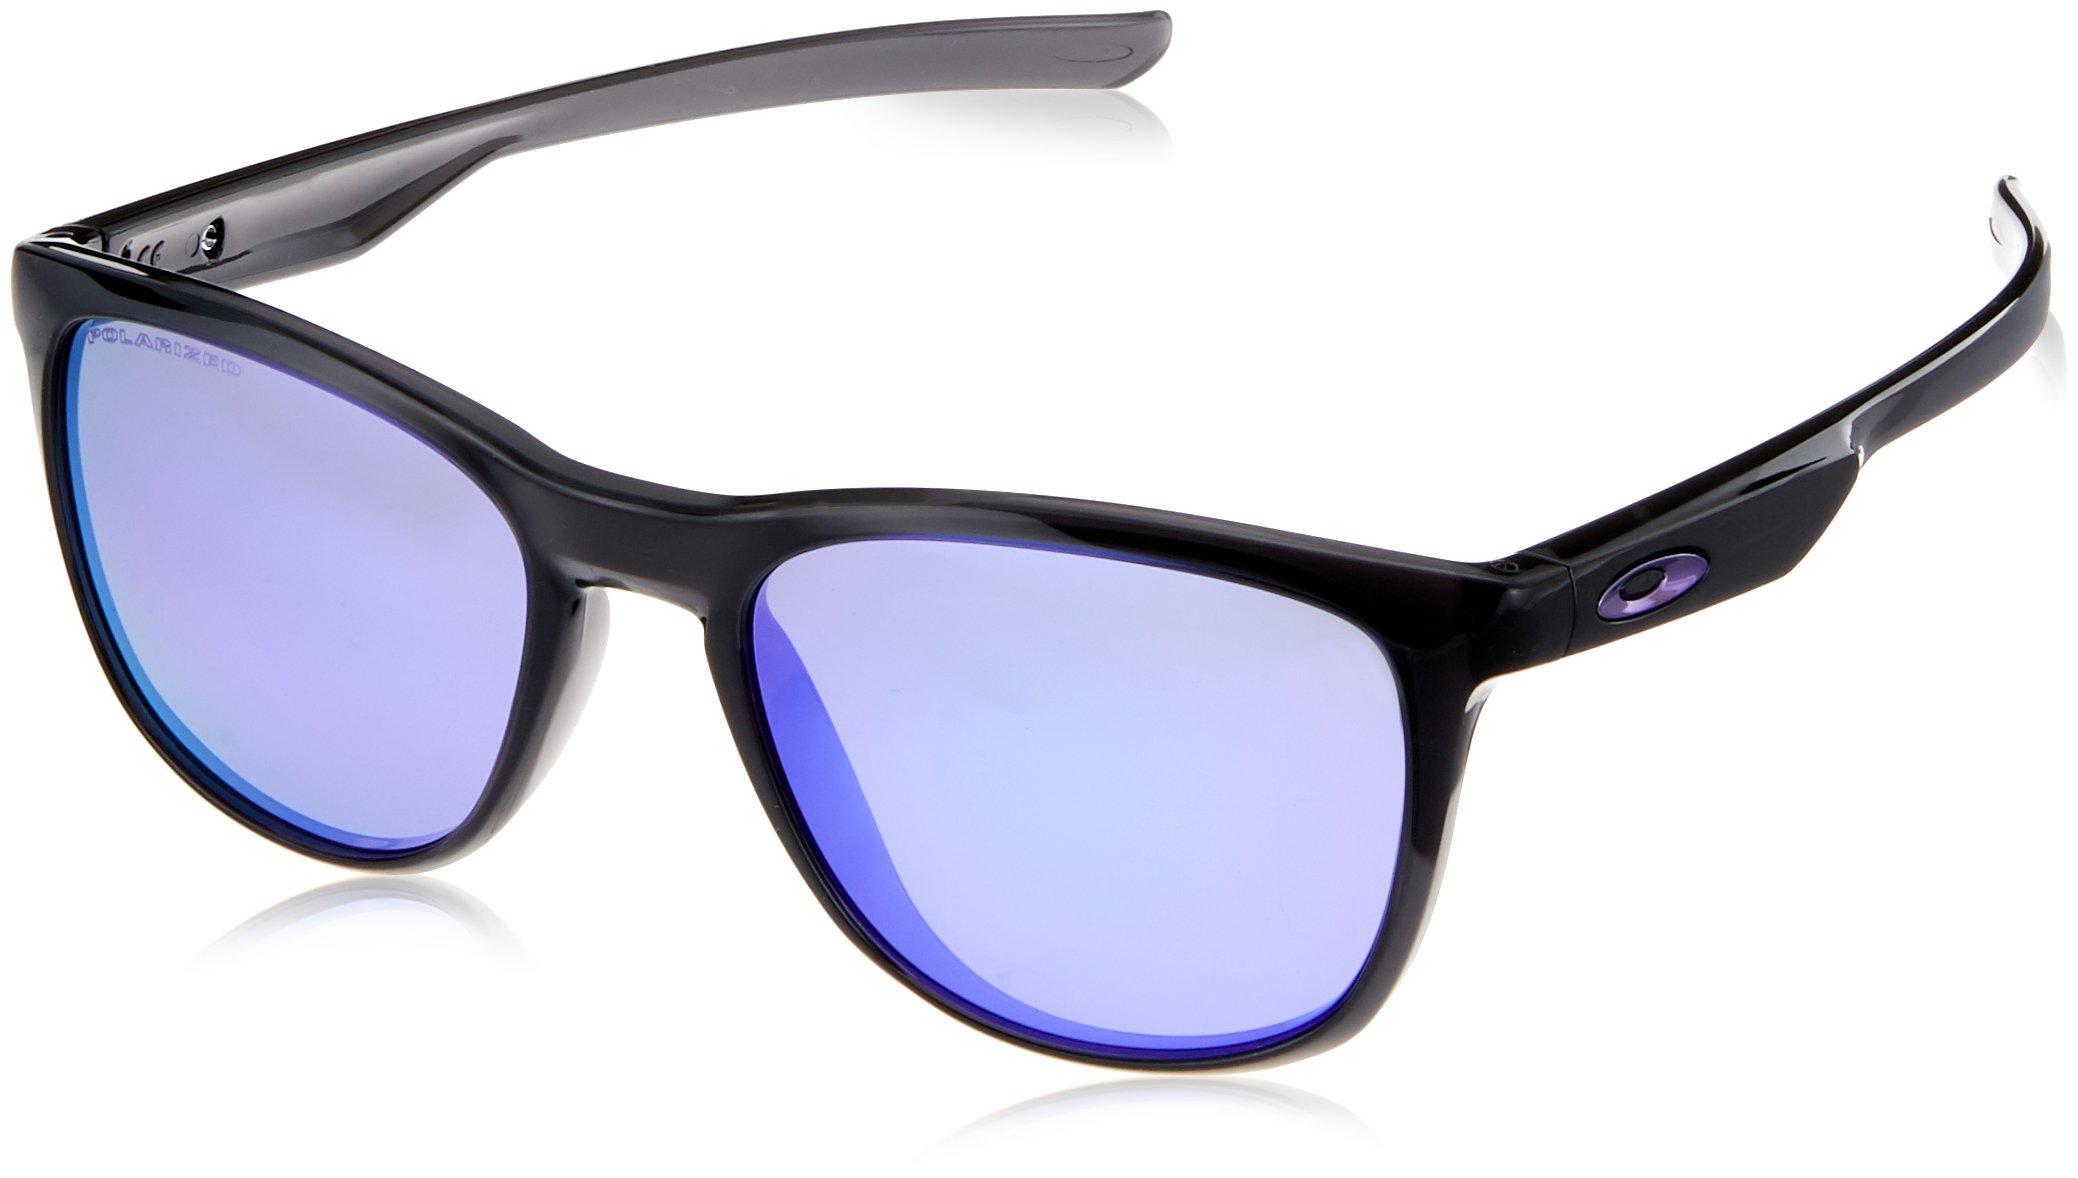 Oakley Men's Trillbe X Polarized Iridium Rectangular Sunglasses POLISHED BLACK INK 52 mm